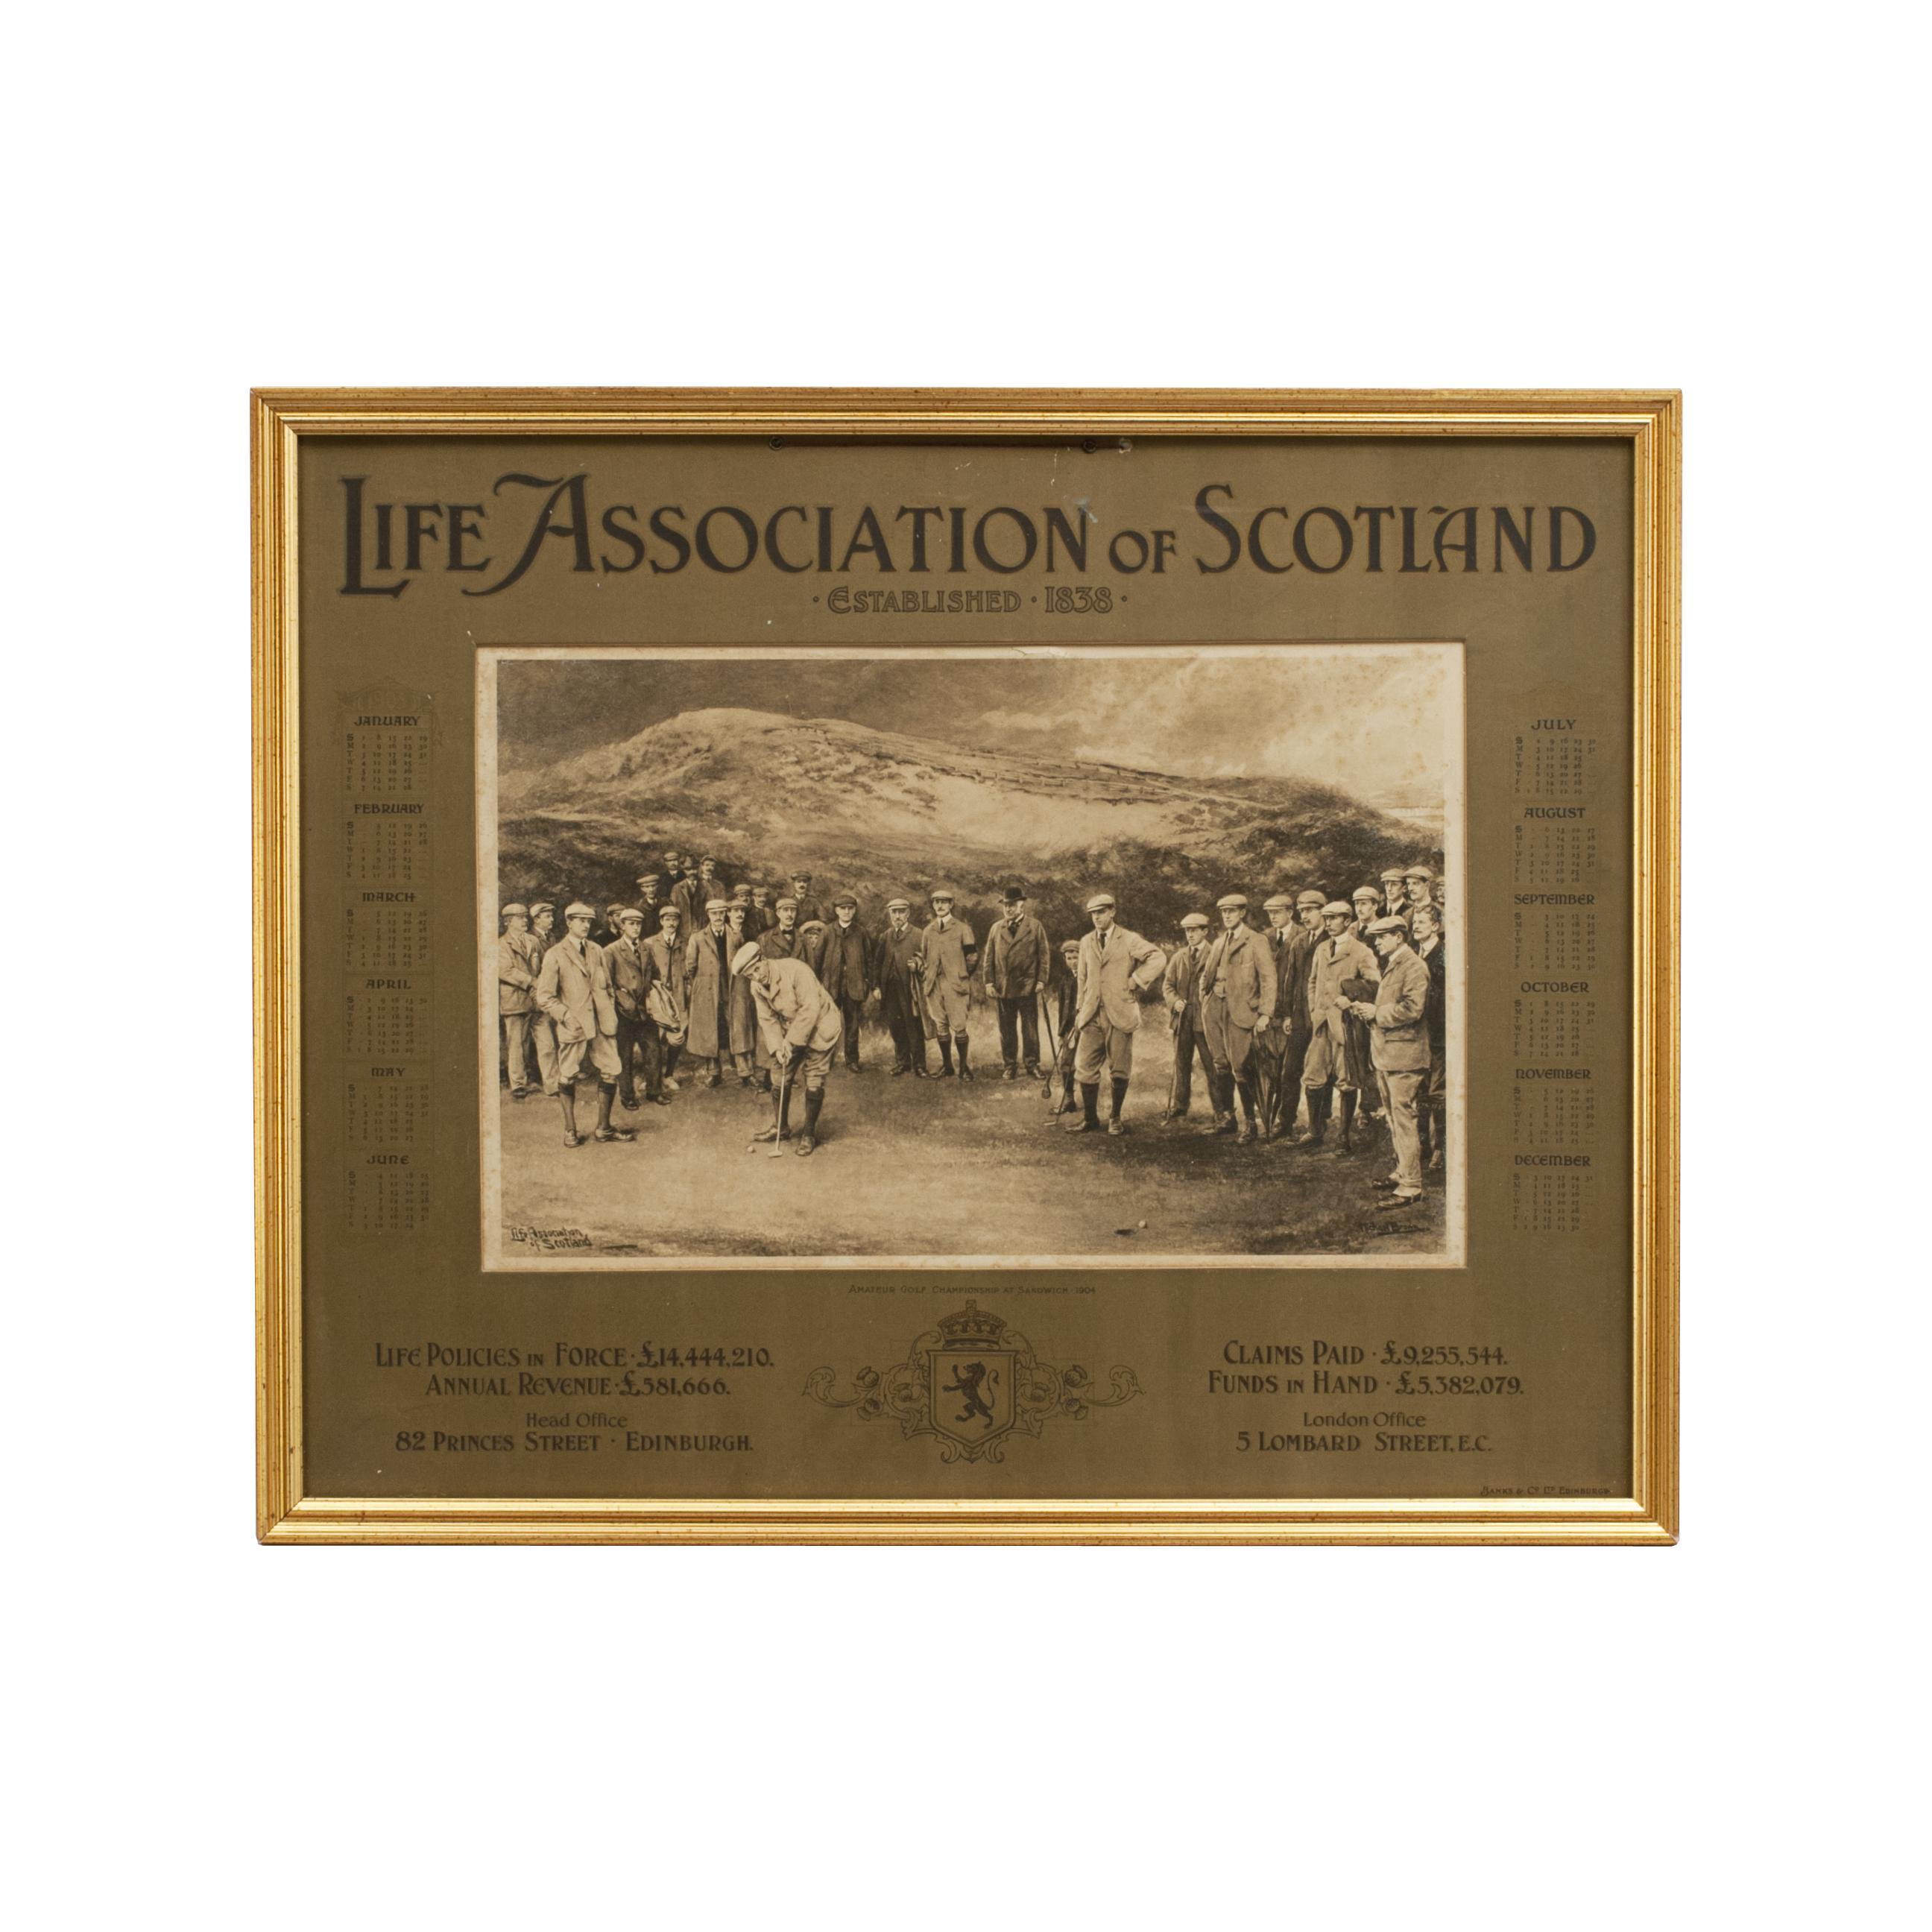 Antique Golf Print, Royal St. Georges, Sandwich, Life Association of Scotland, M